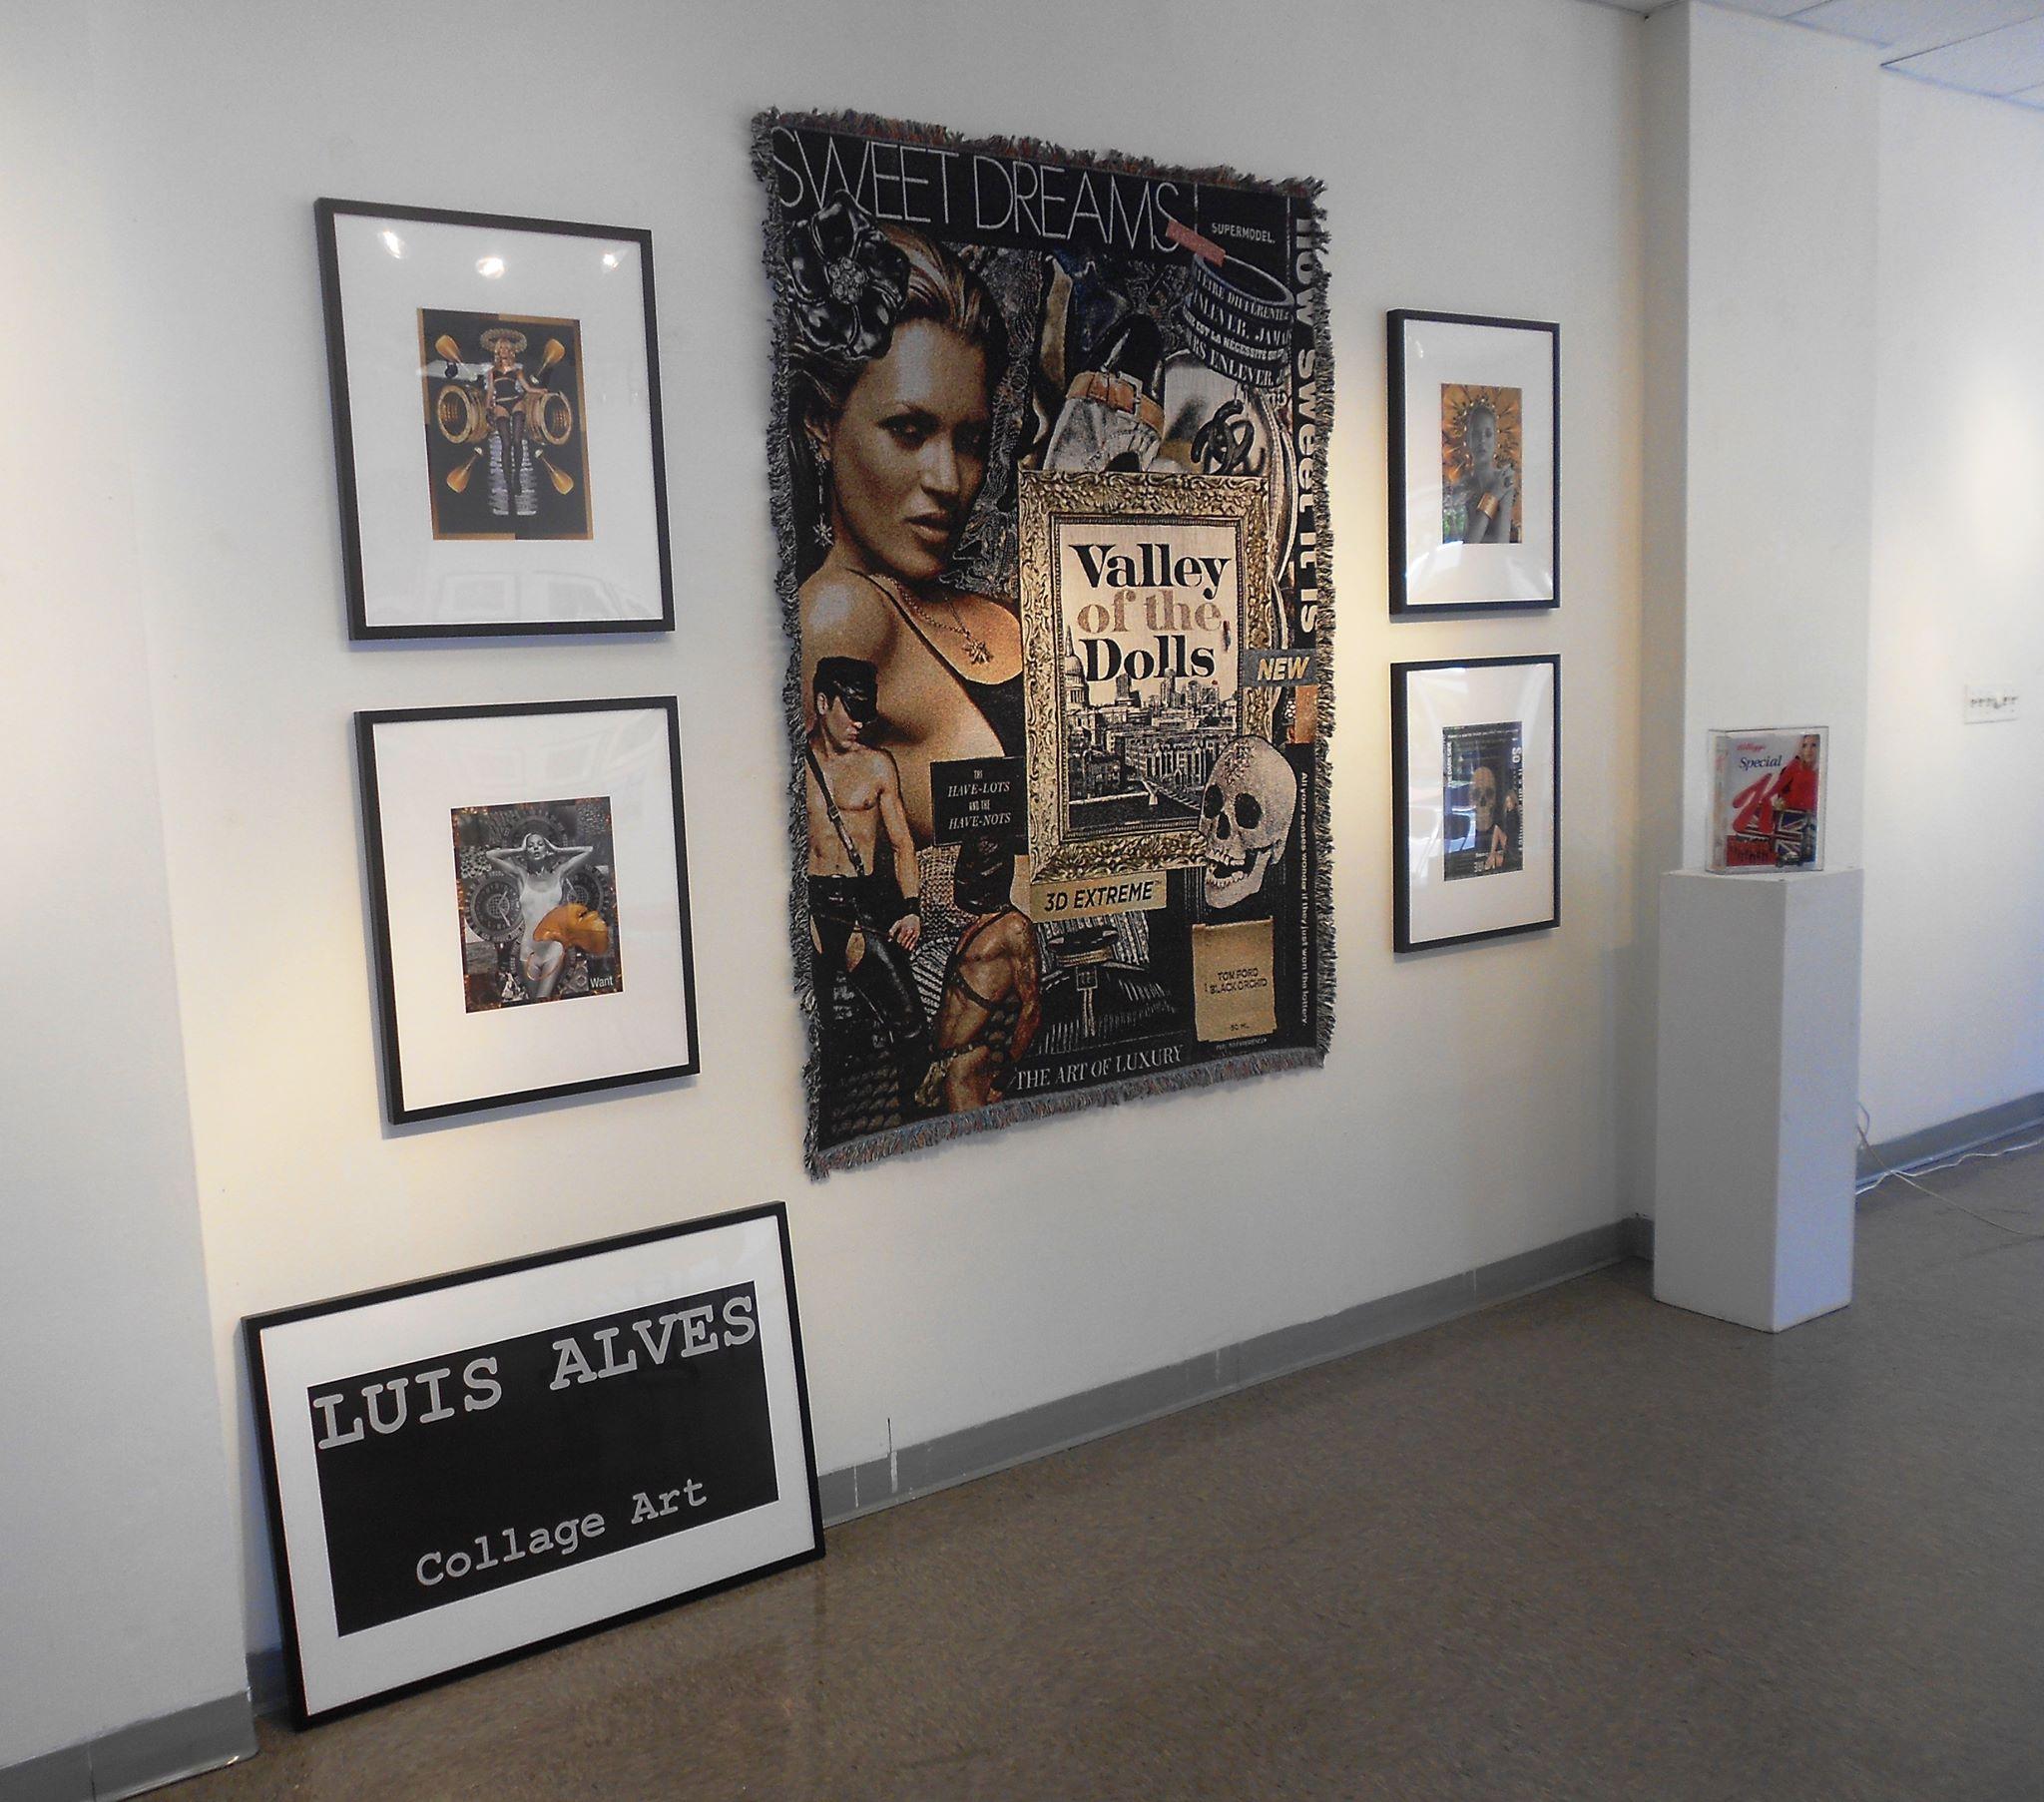 Luis Alves Collage at 1978 Arts Center 2013